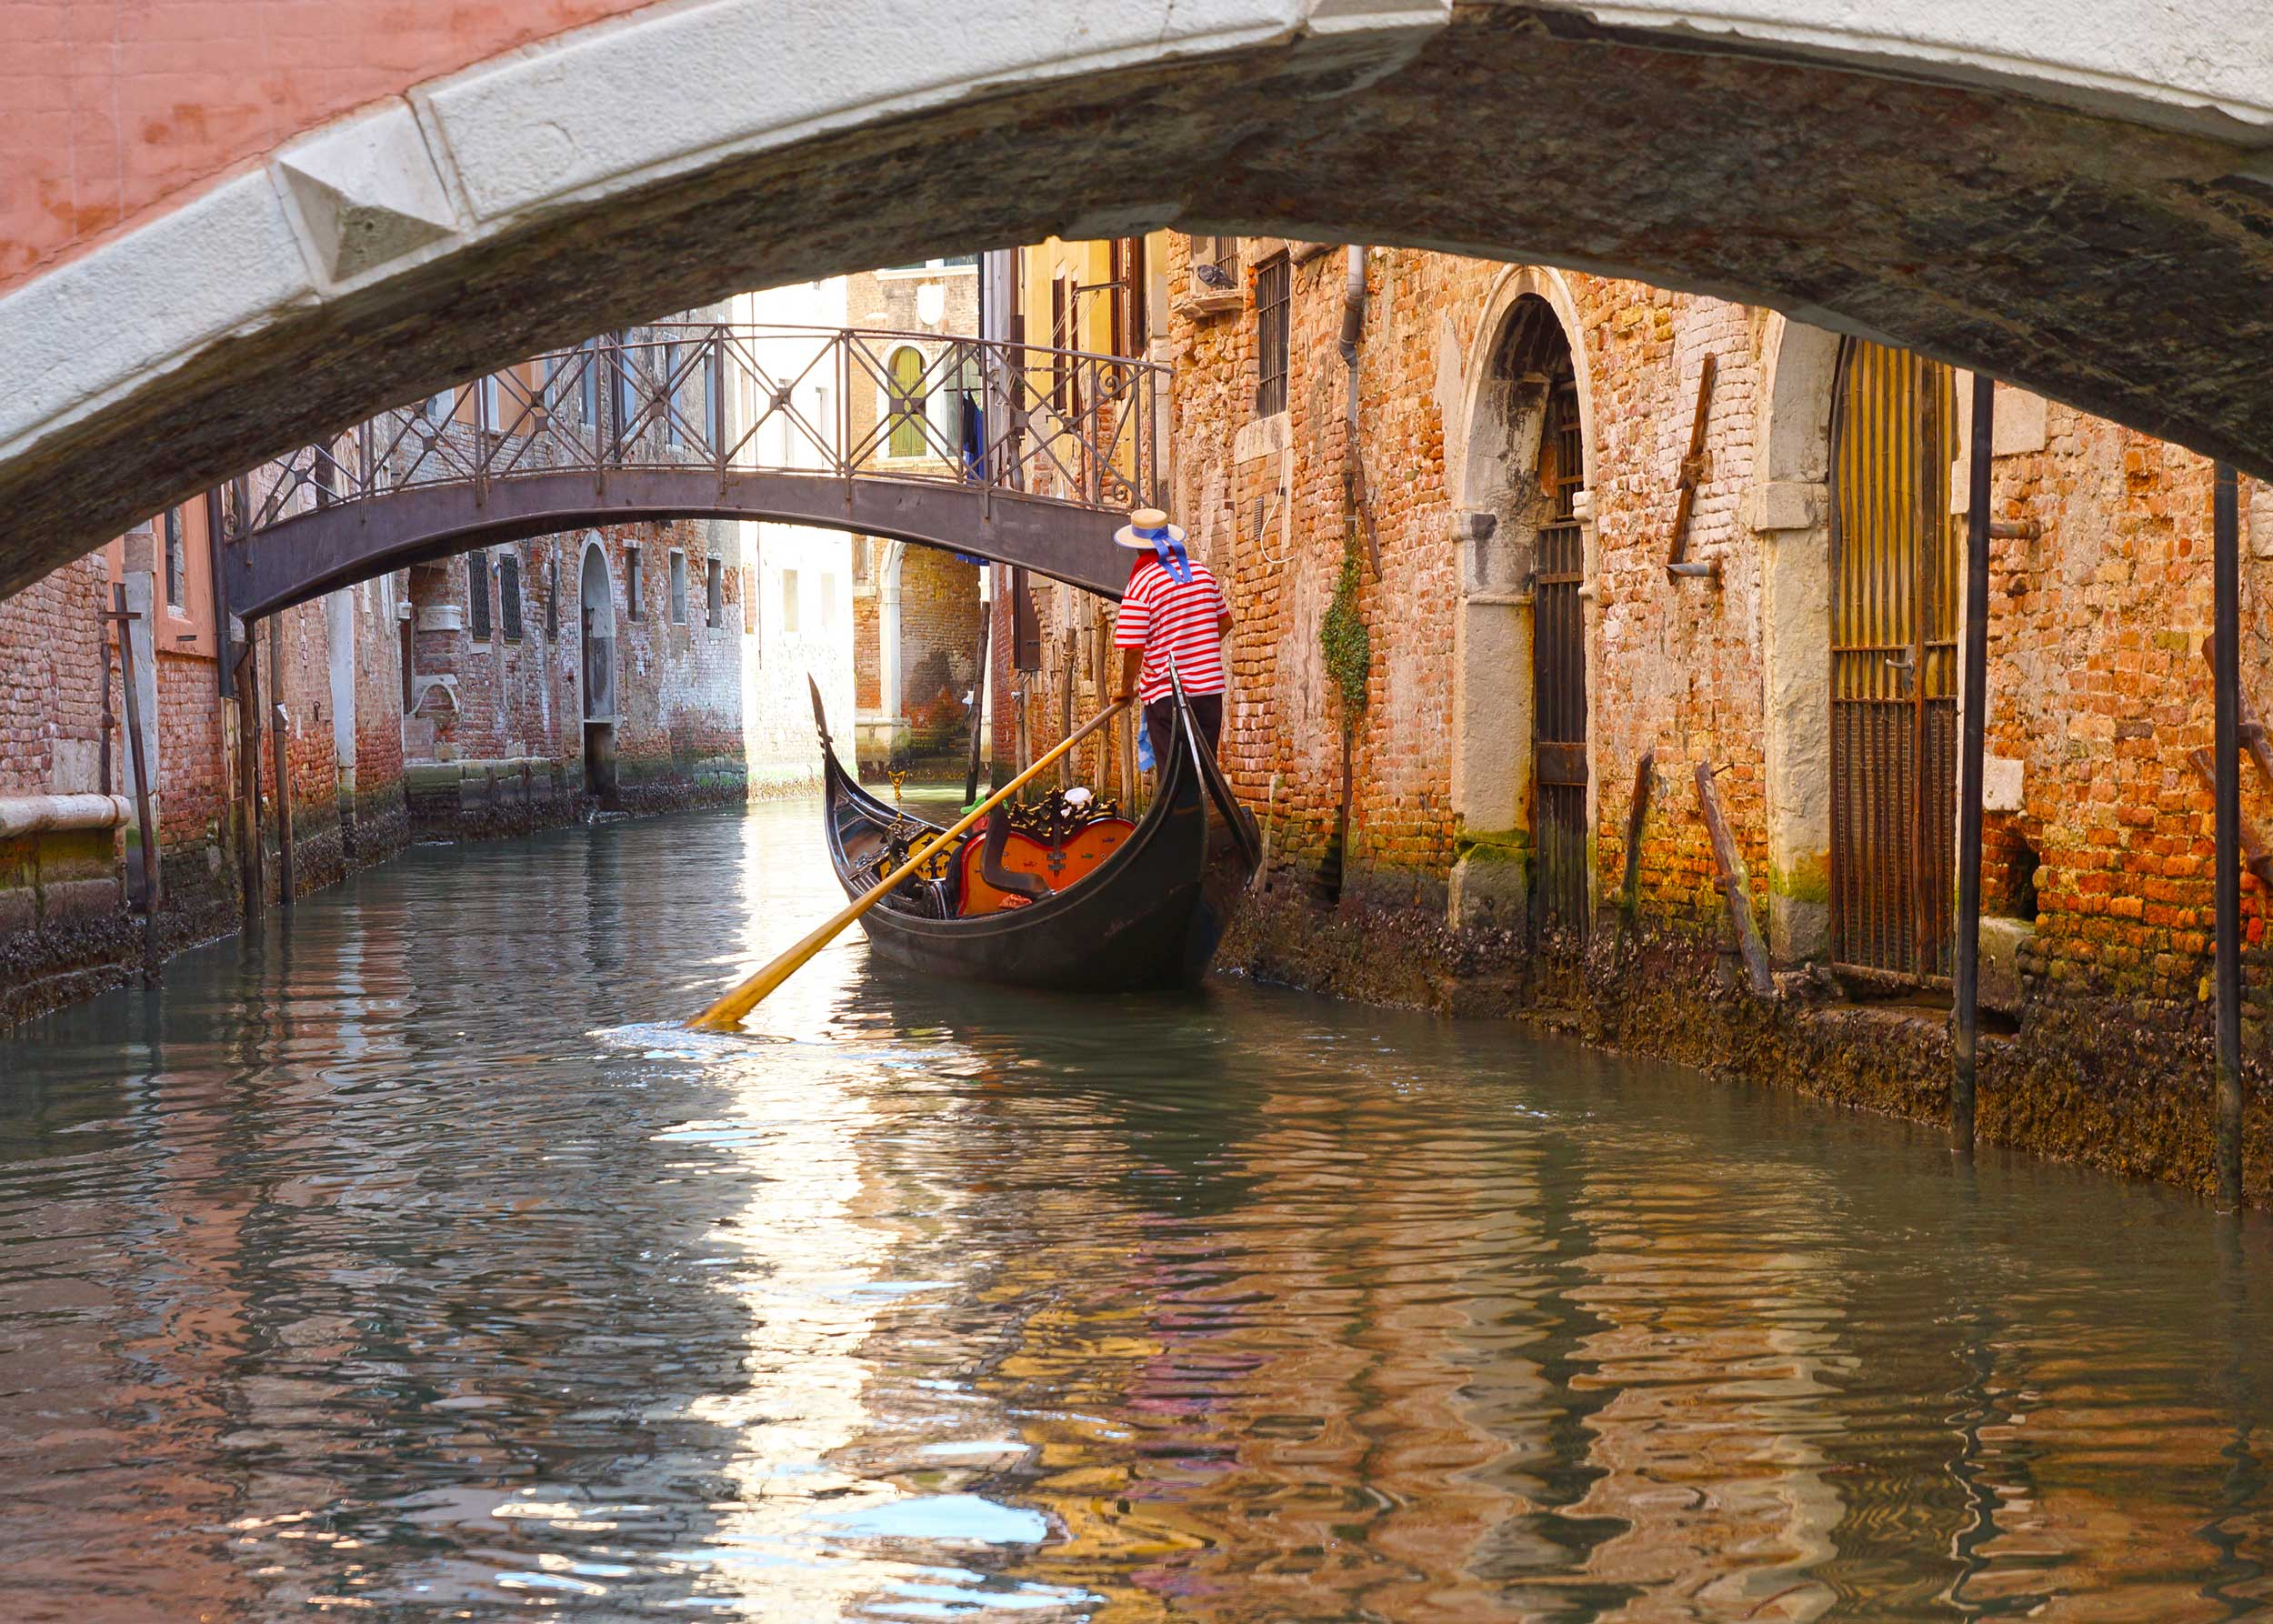 Gondola Tour and Aperitif in a luxury location